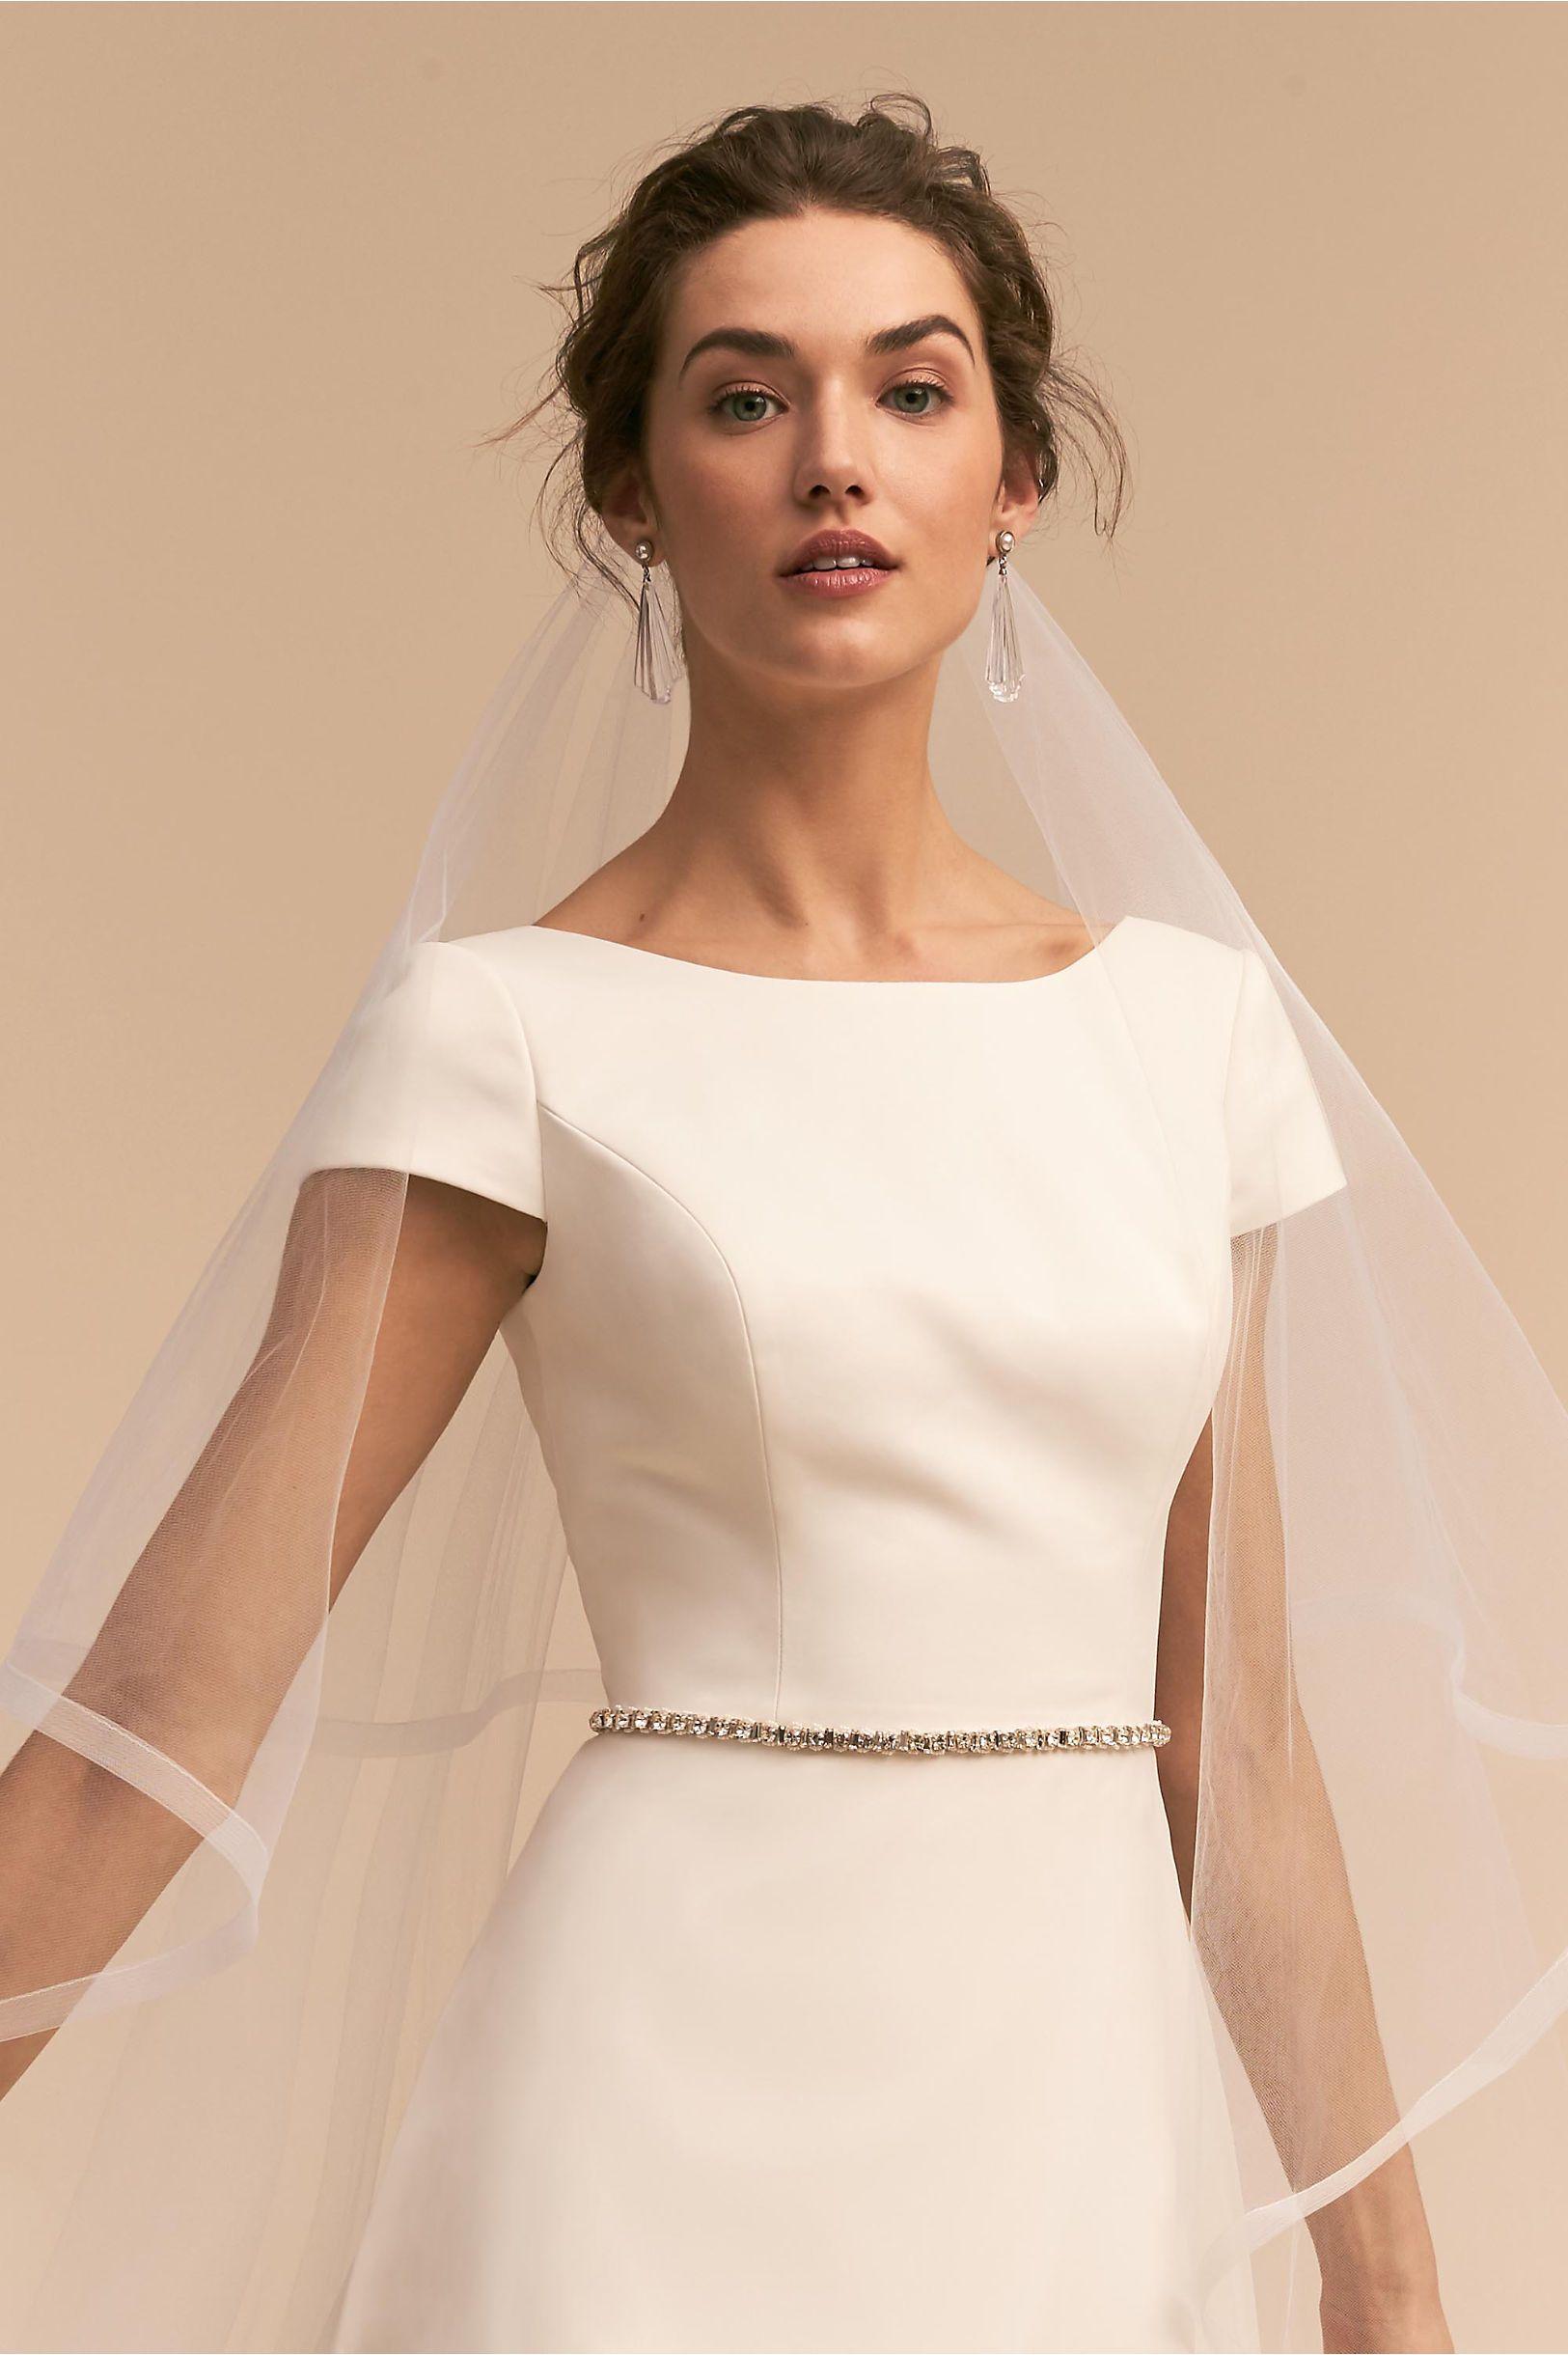 12 Most Romantic Wedding Dresses Ever Emmaline Bride Wedding Dresses Romantic Stylish Wedding Dresses Modest Wedding Dresses [ 2440 x 1625 Pixel ]